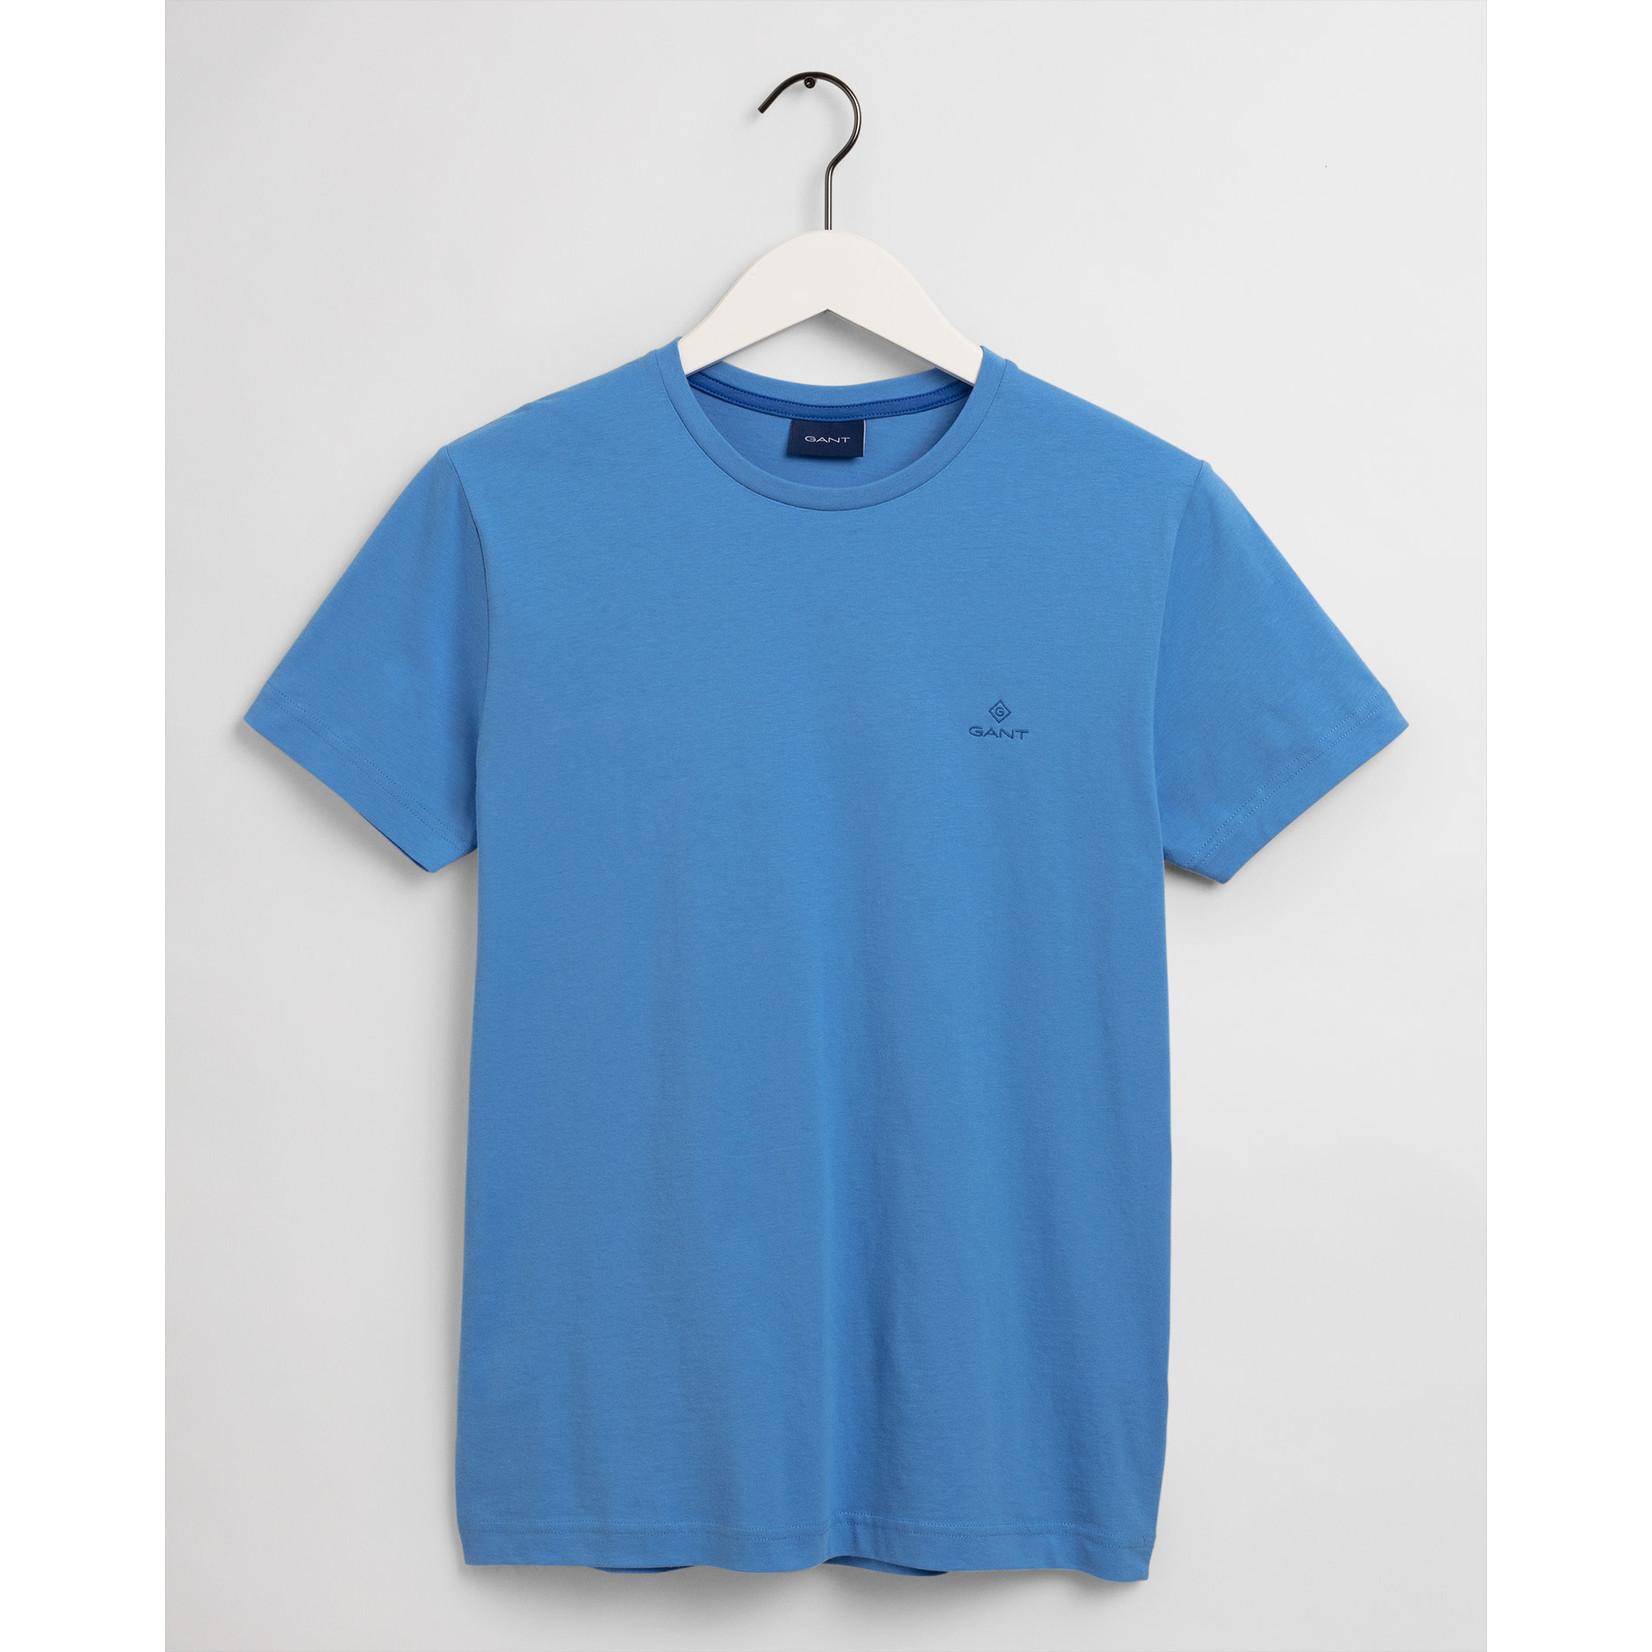 GANT T-shirt met contrasterend logo kobalt